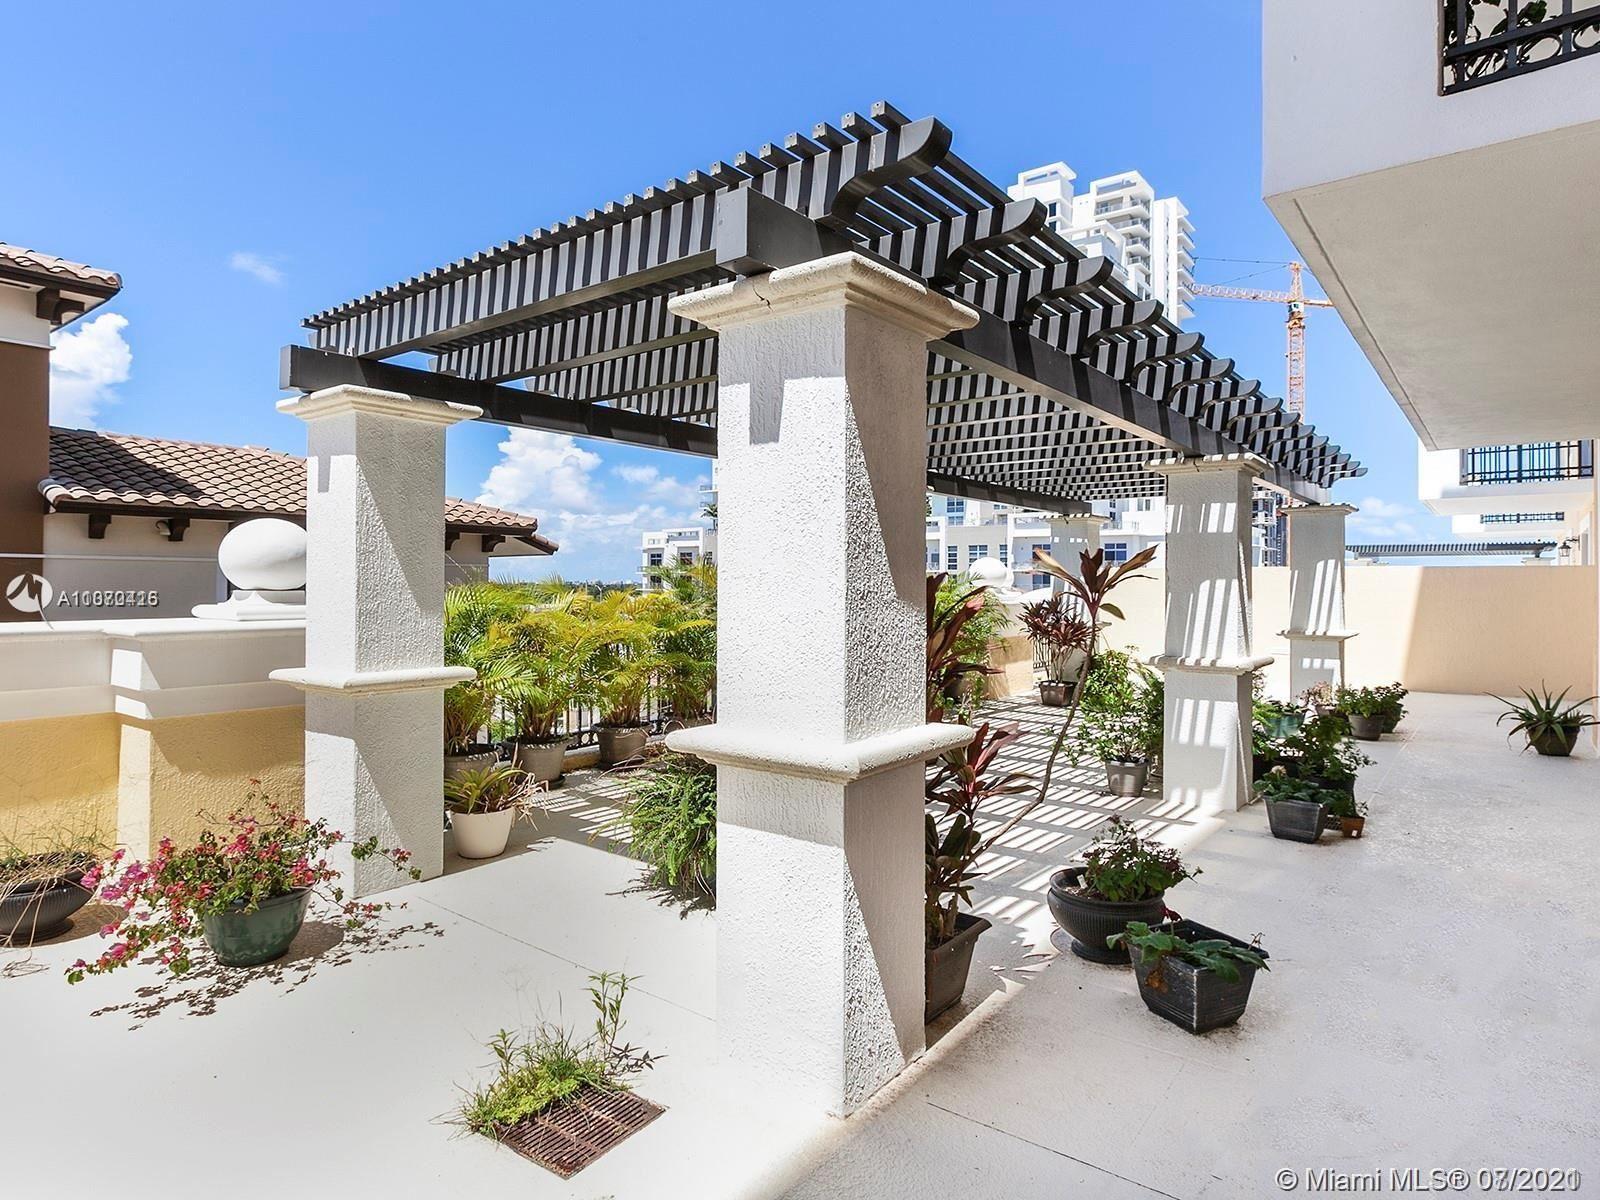 8390 SW 72nd Ave #610, Miami, FL 33143 - #: A11070416